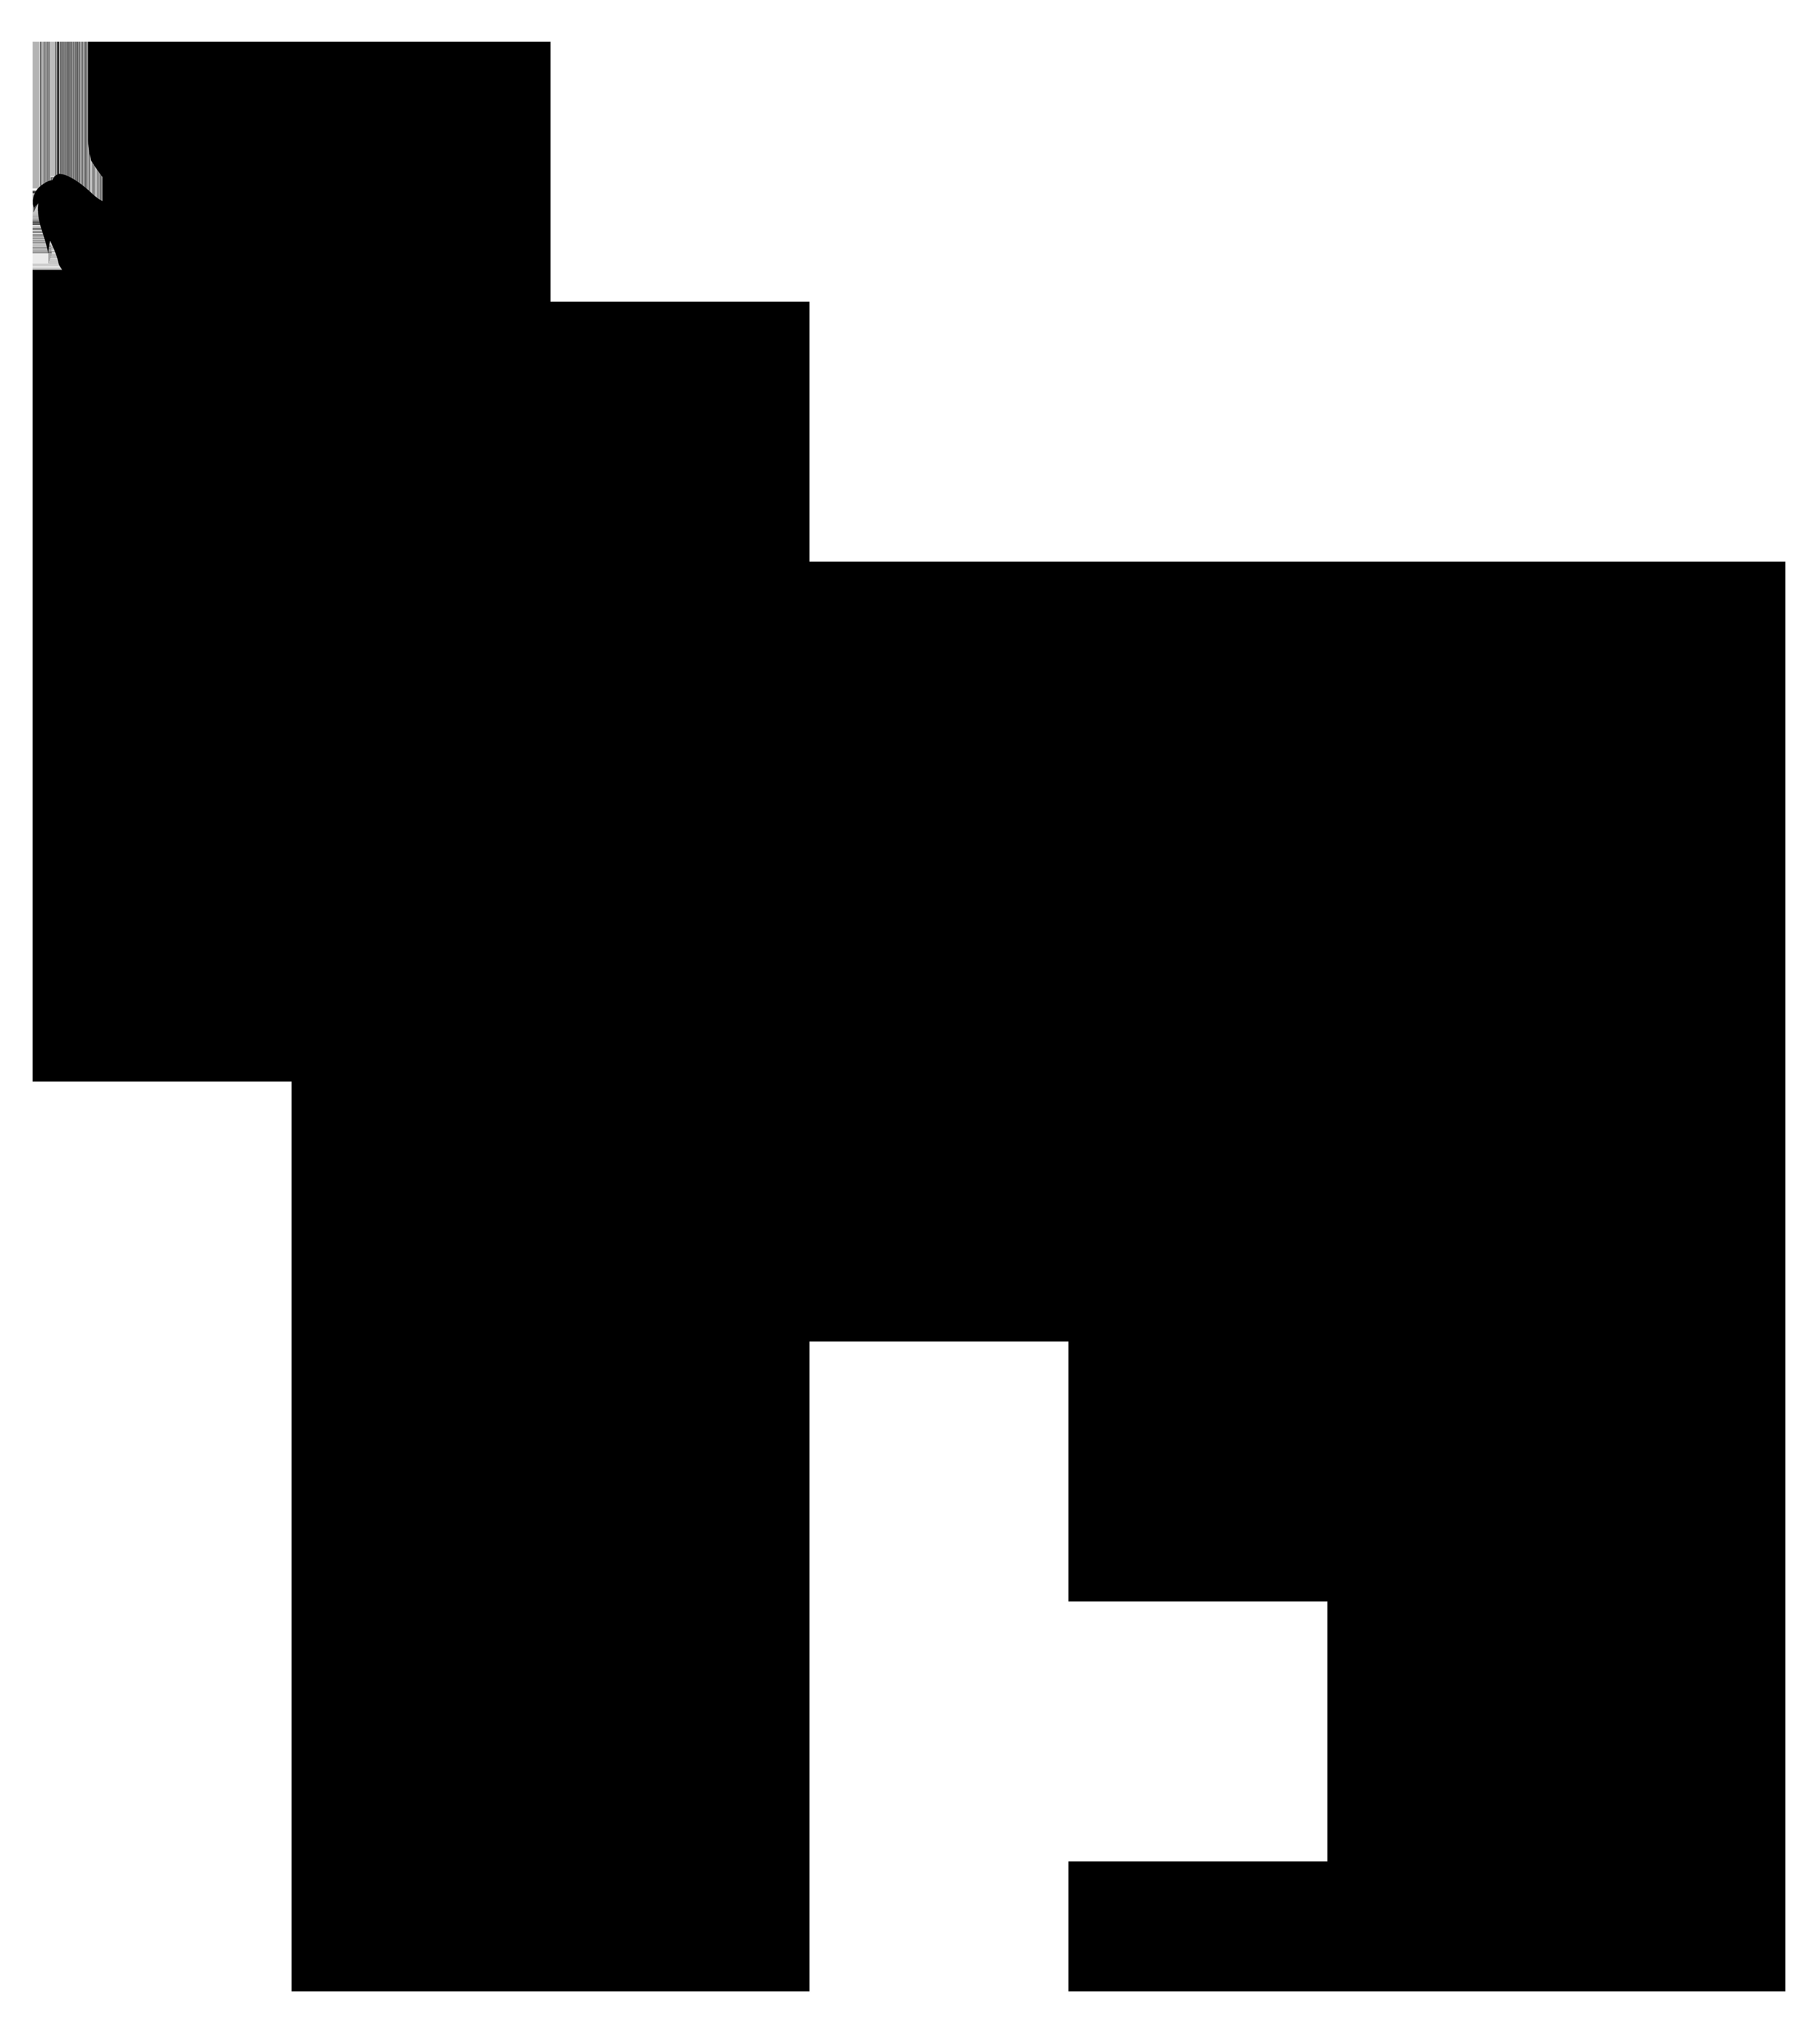 7197x8000 Howling Wolf Silhouette Png Transparent Clip Art Imageu200b Gallery